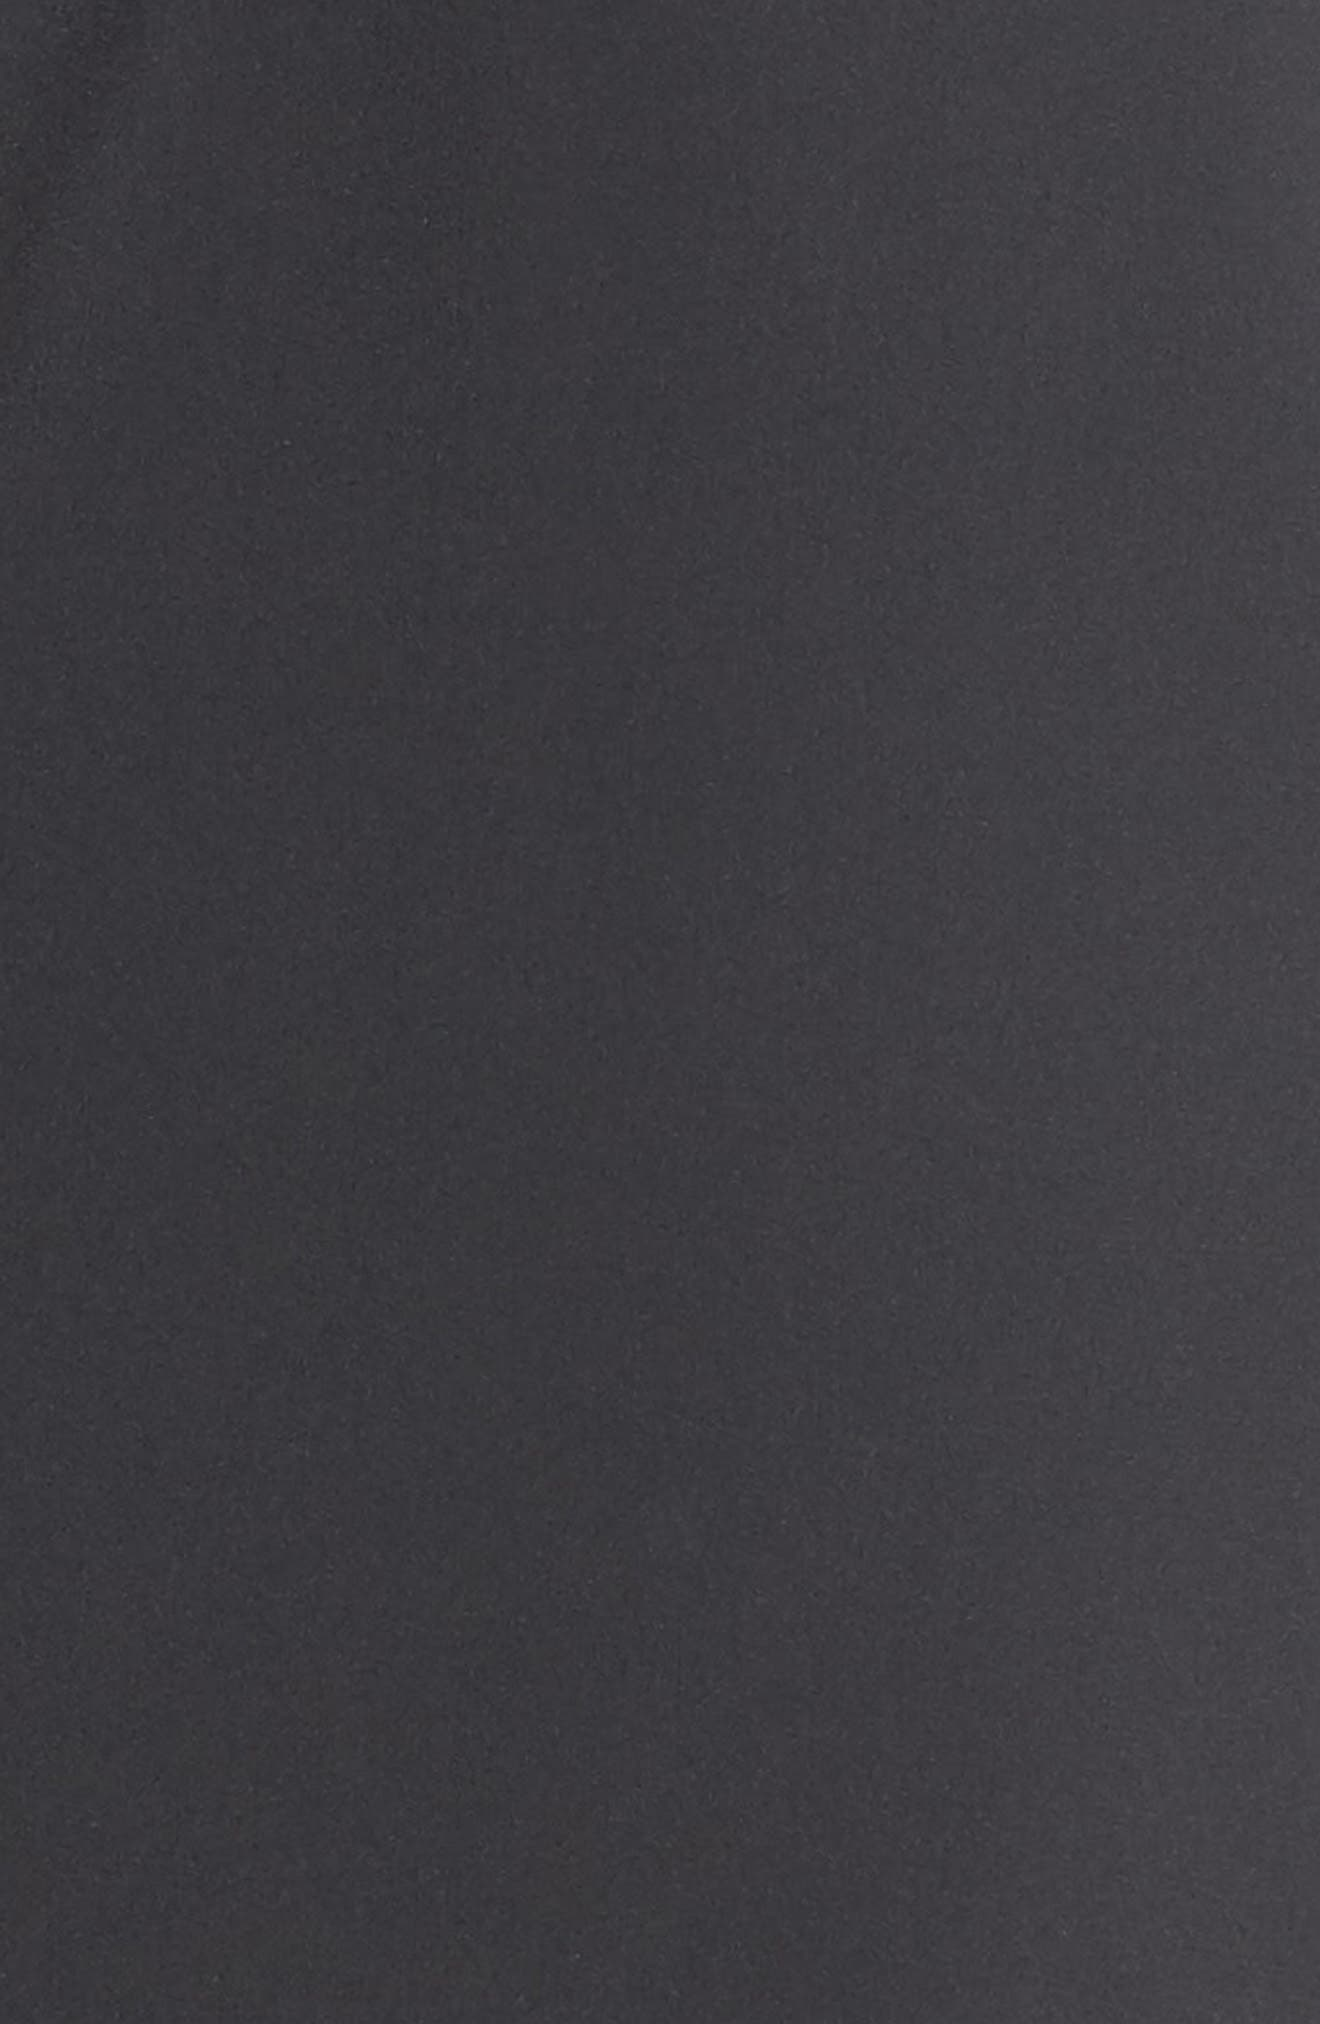 Flex 5-Inch Inseam Running Shorts,                             Alternate thumbnail 6, color,                             BLACK/ GUNSMOKE